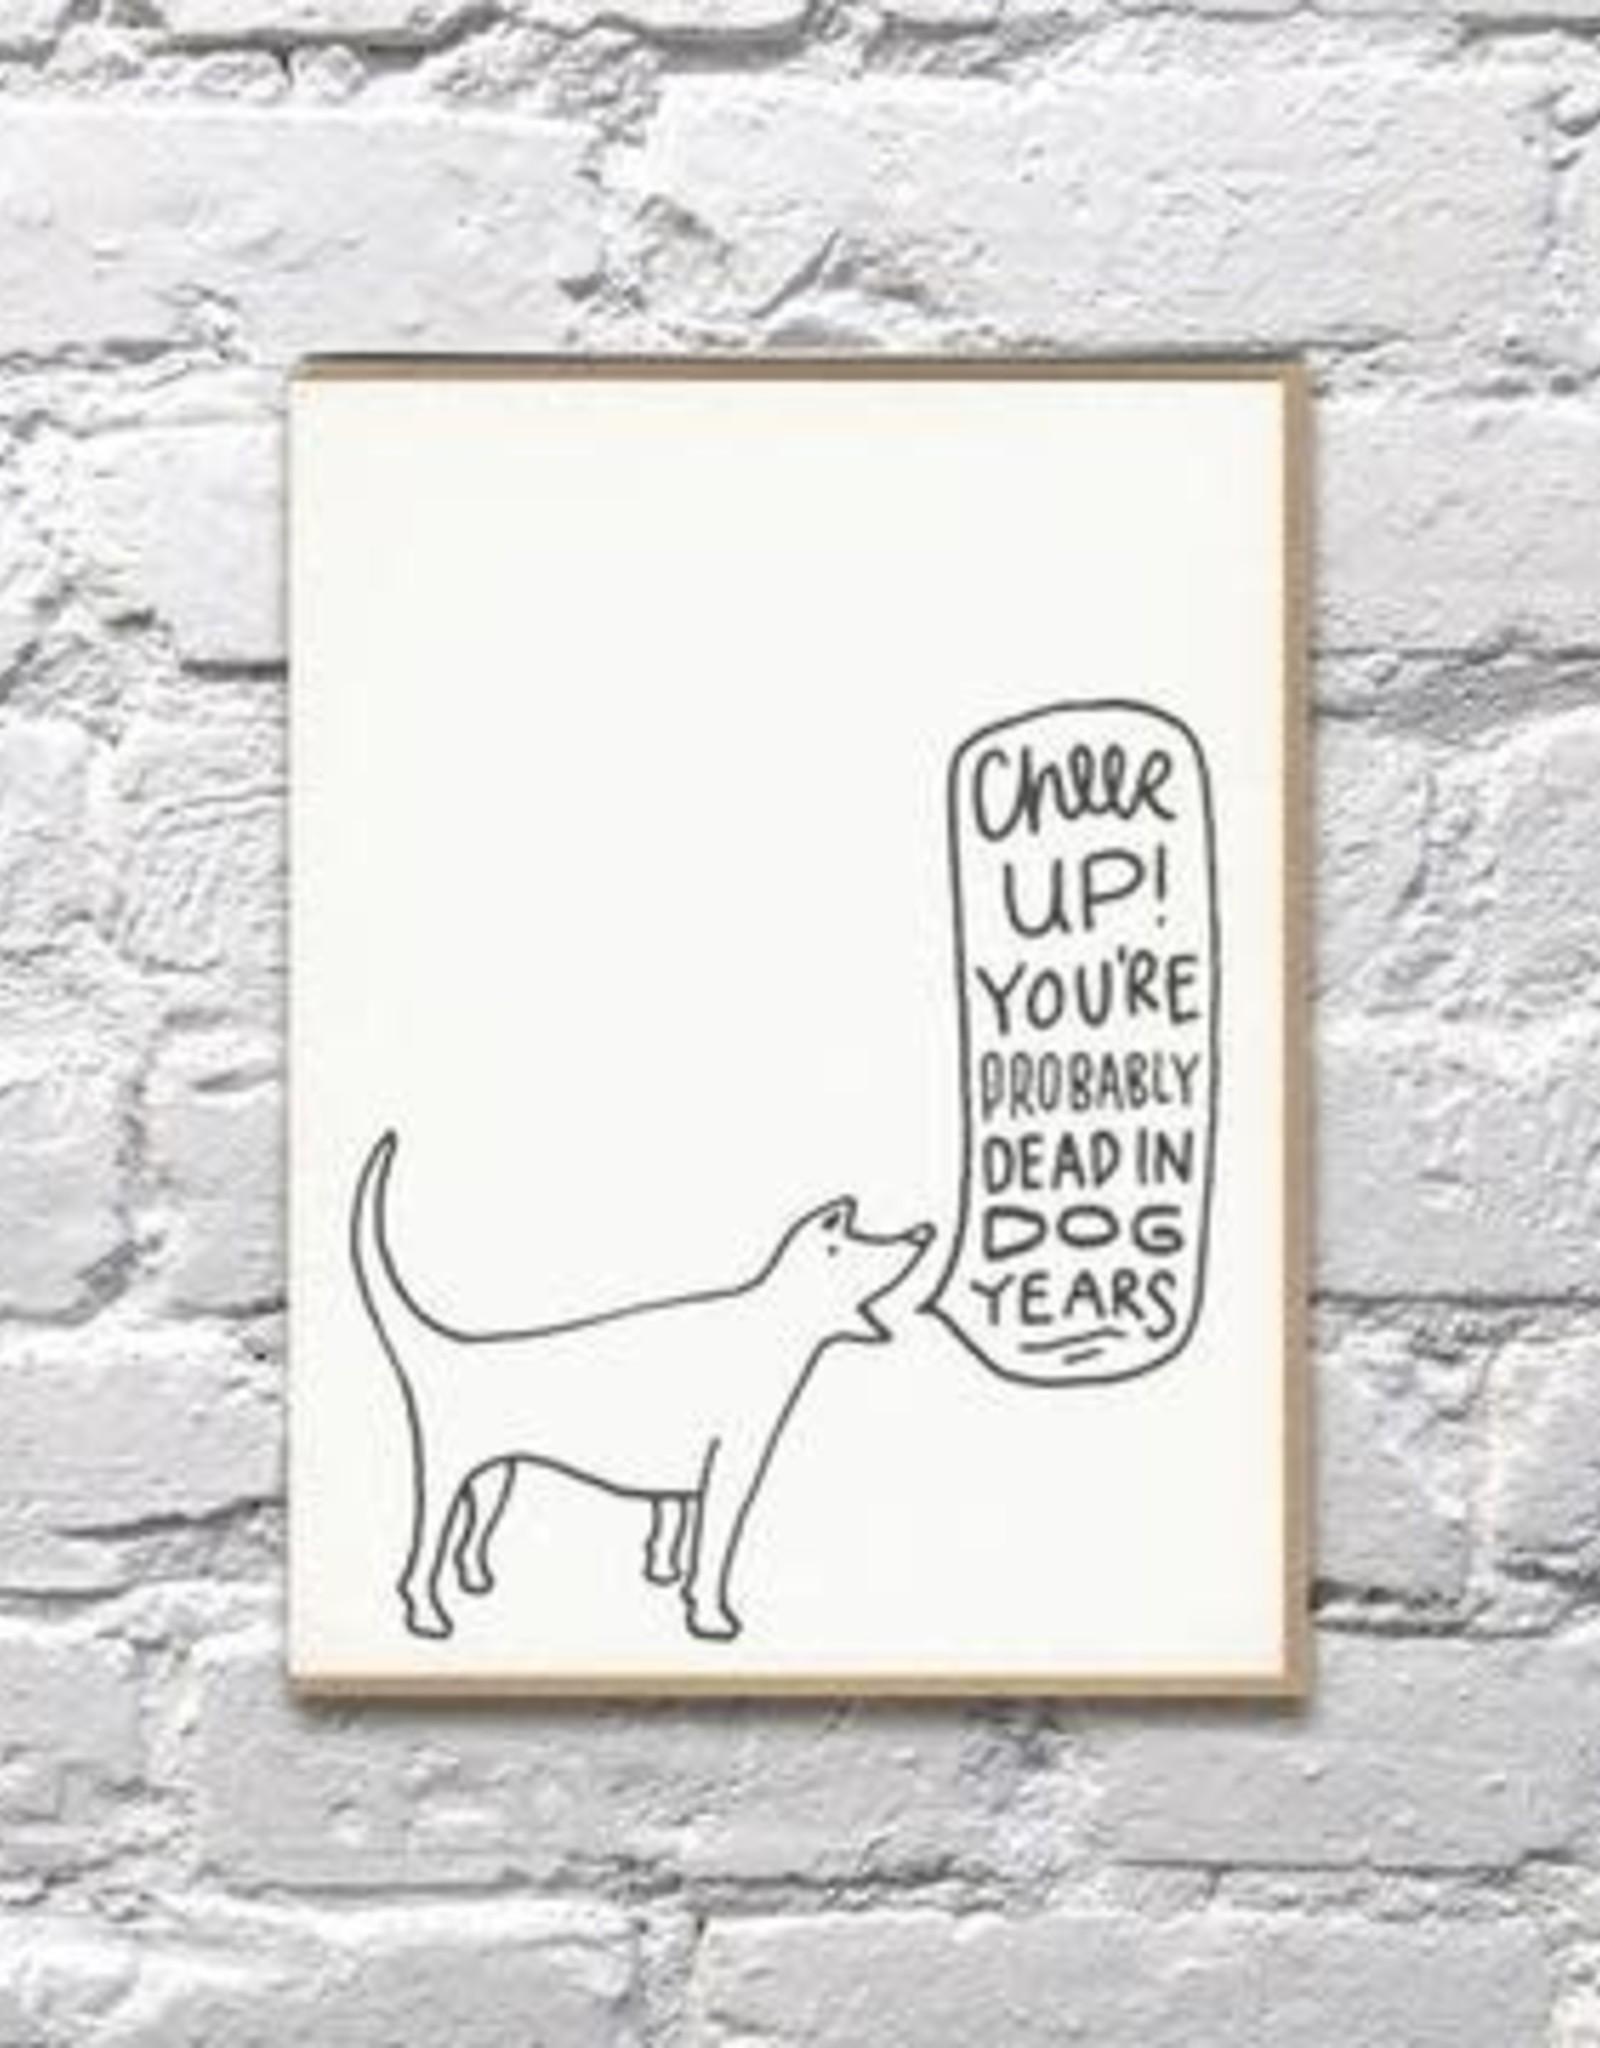 Bench Pressed Bench Pressed | Dog Years Birthday Card